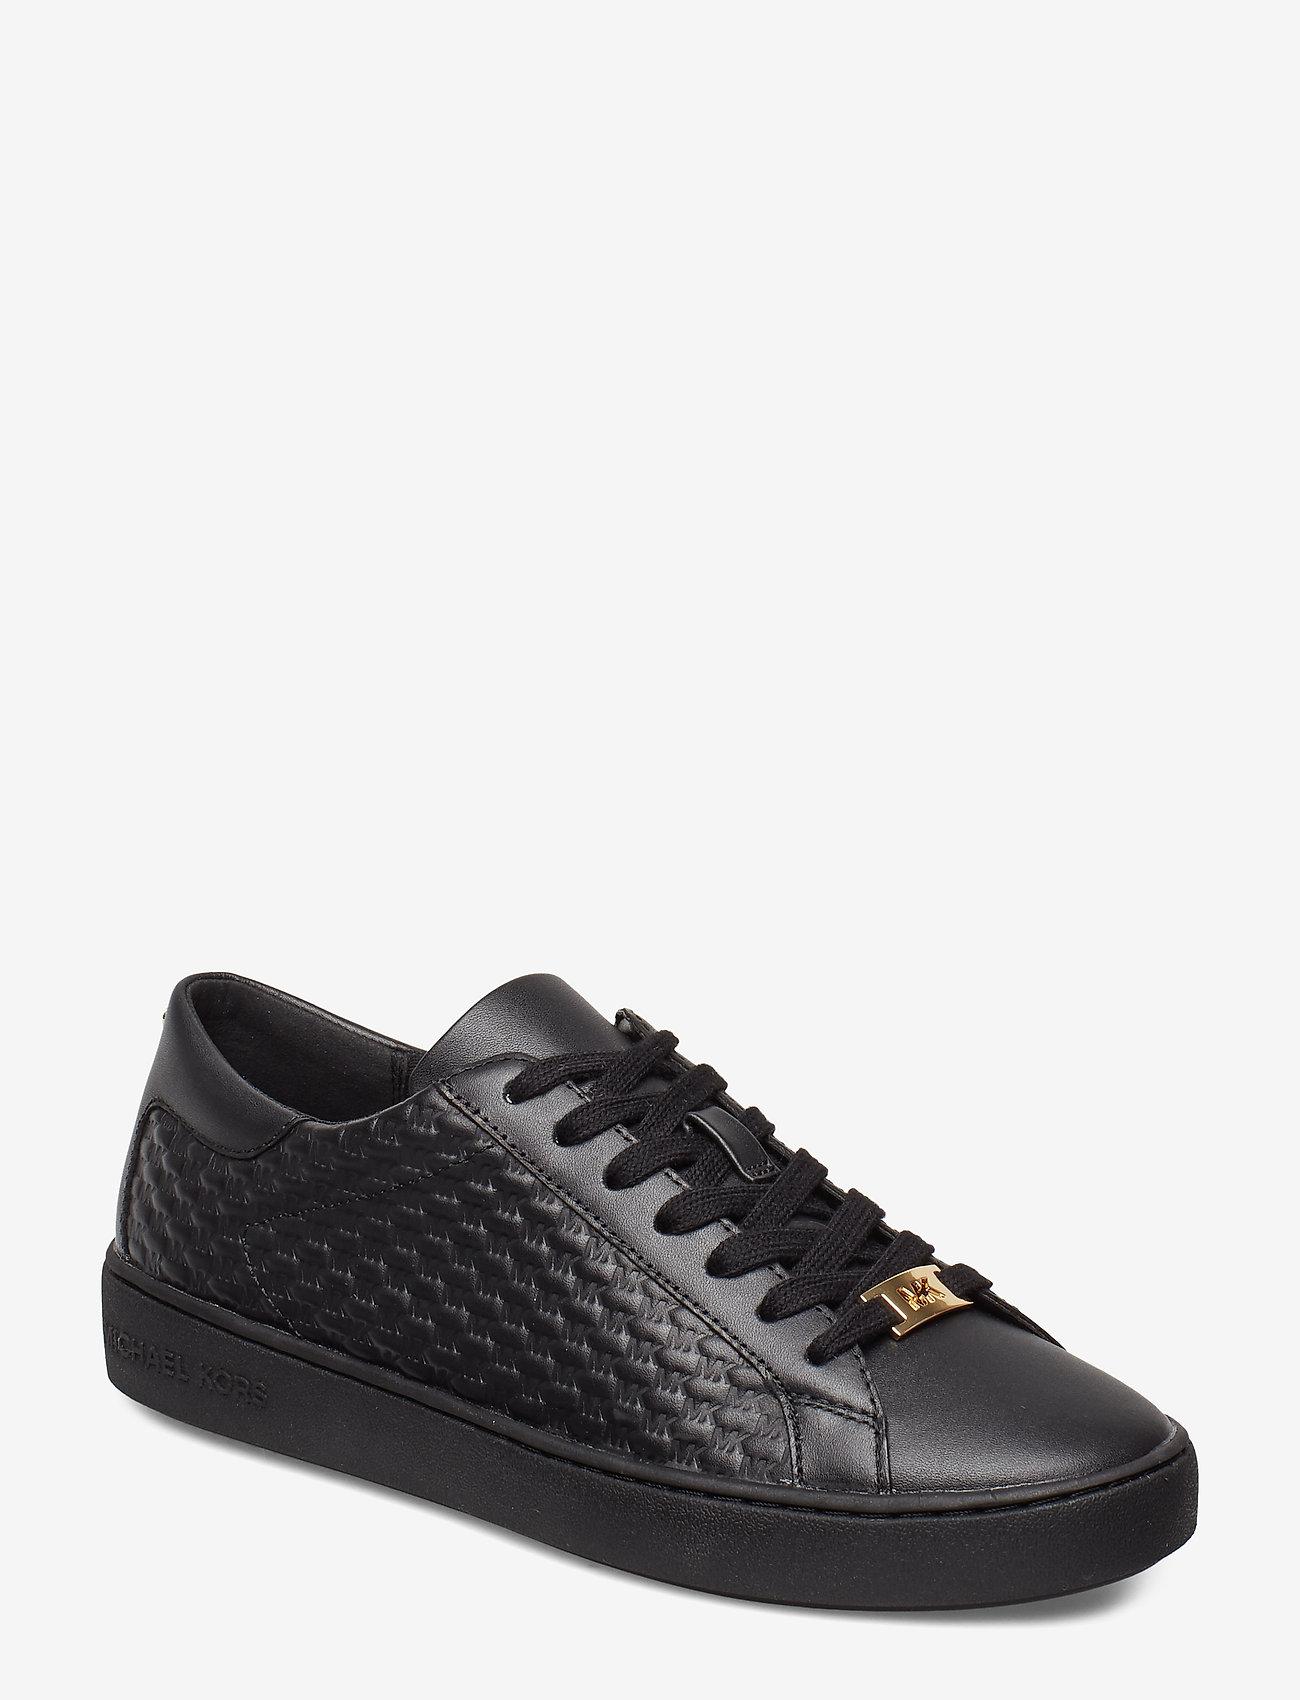 Michael Kors Shoes - | Boozt